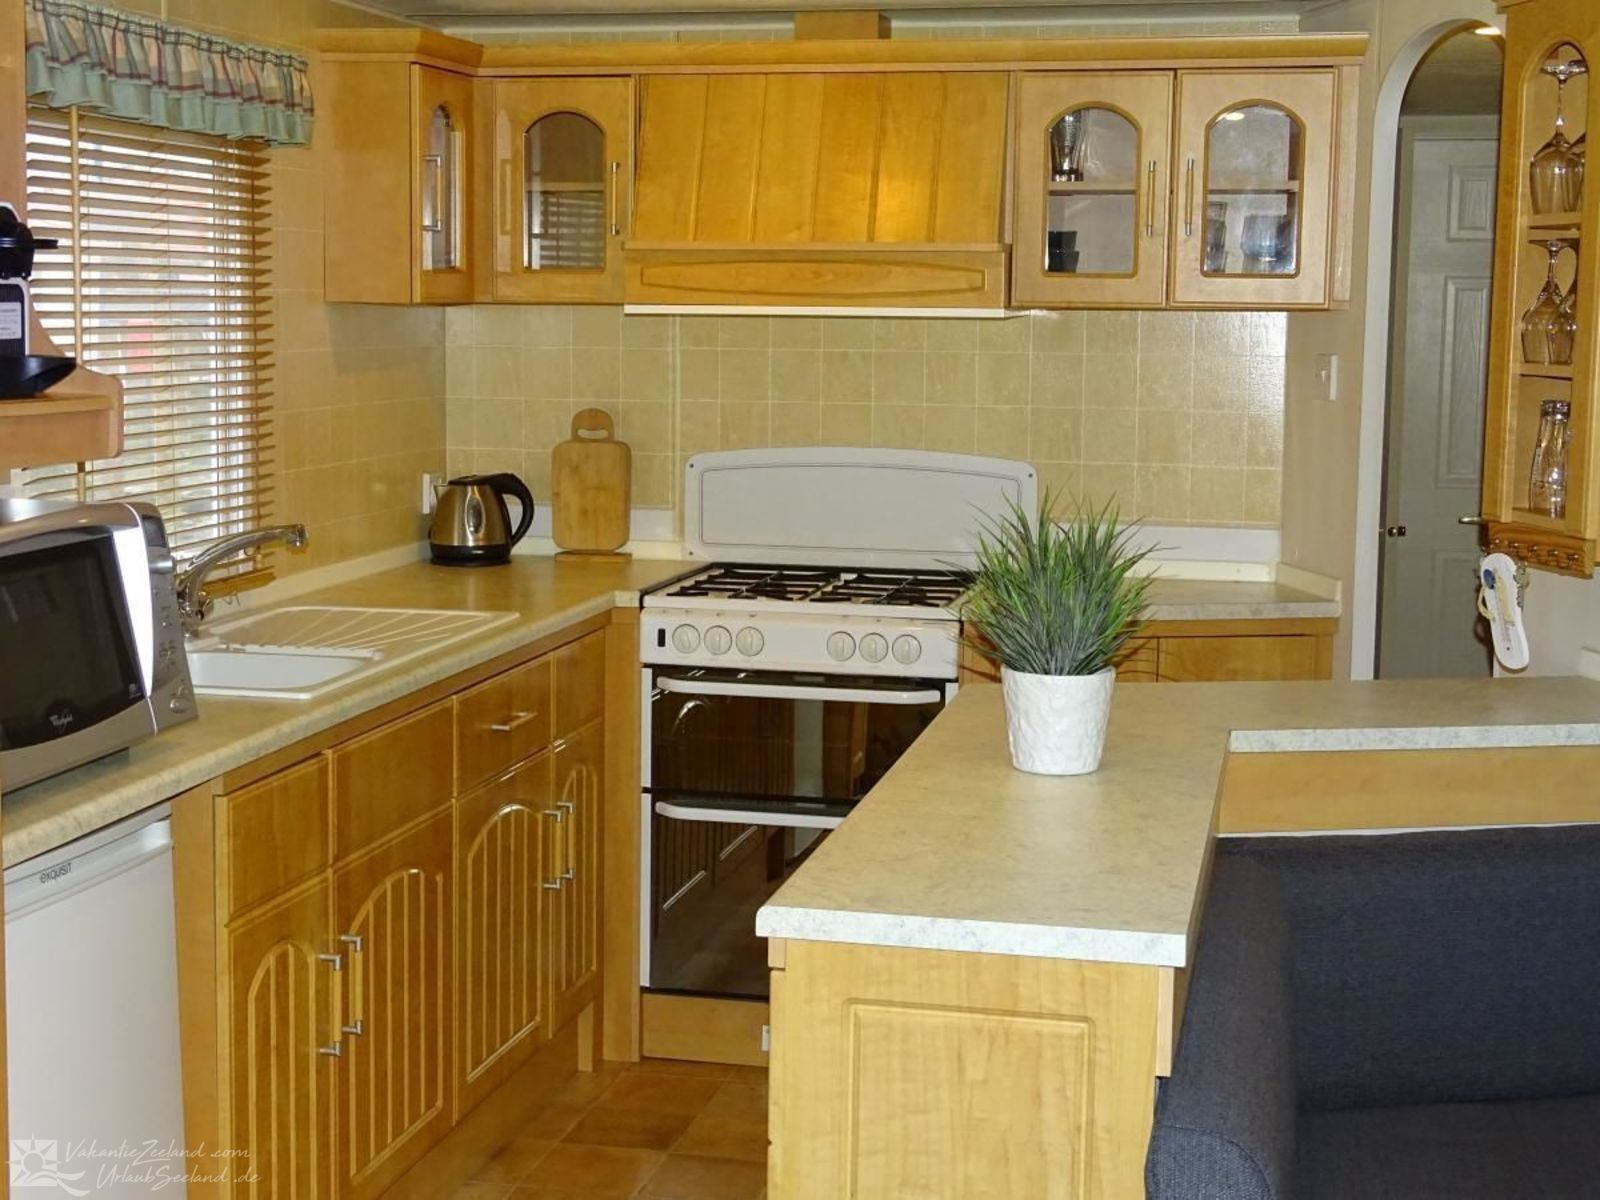 VZ618 - Mobile home 4 people Burgh-Haamstede